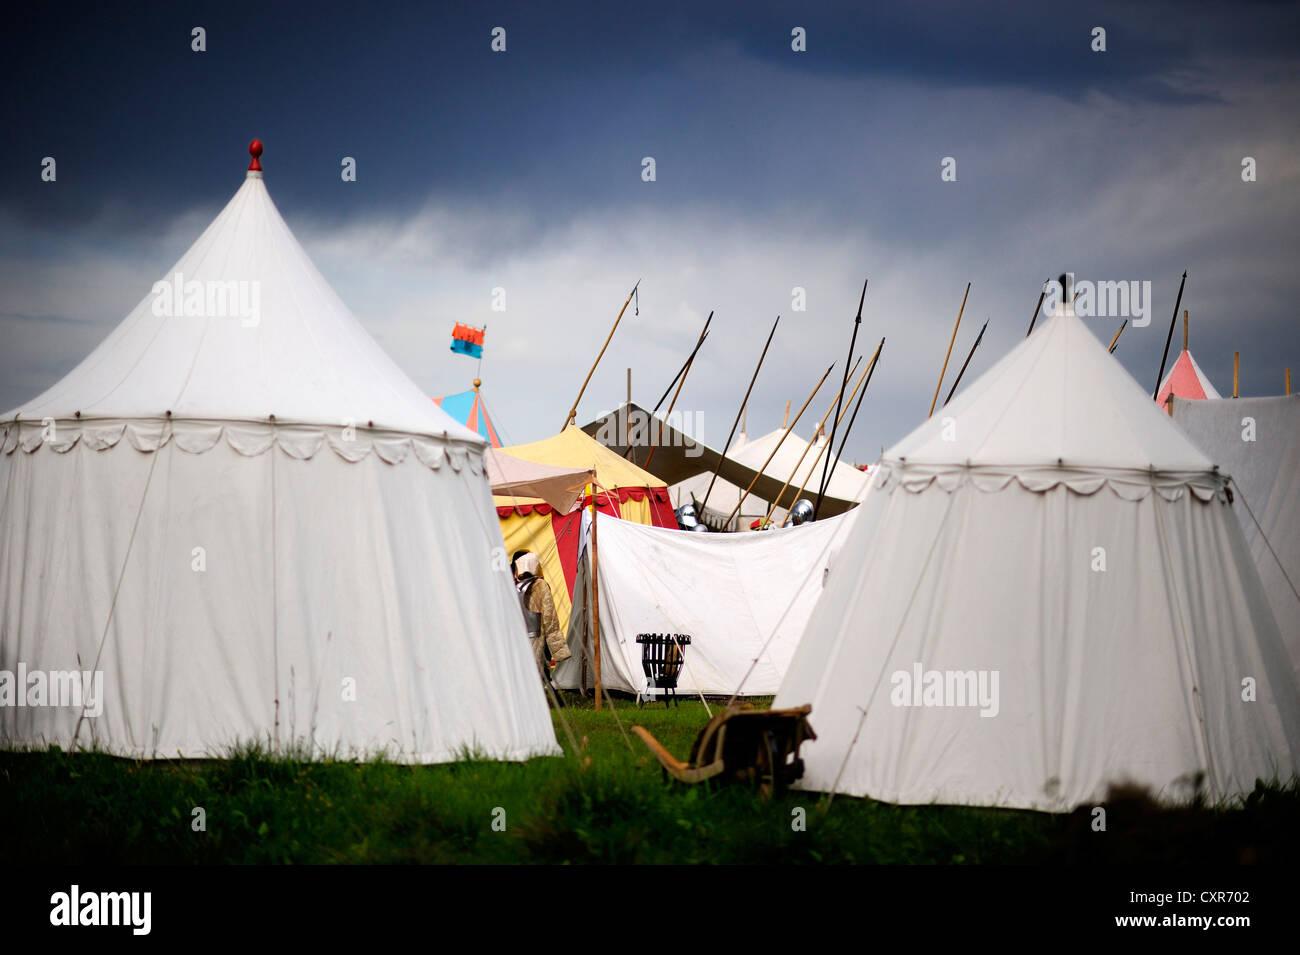 Camp, historical re-enactment, Landsknecht Hurra 2012, Mittelberg, Upper Allgaeu, Swabia, Bavaria, Germany, Europe - Stock Image